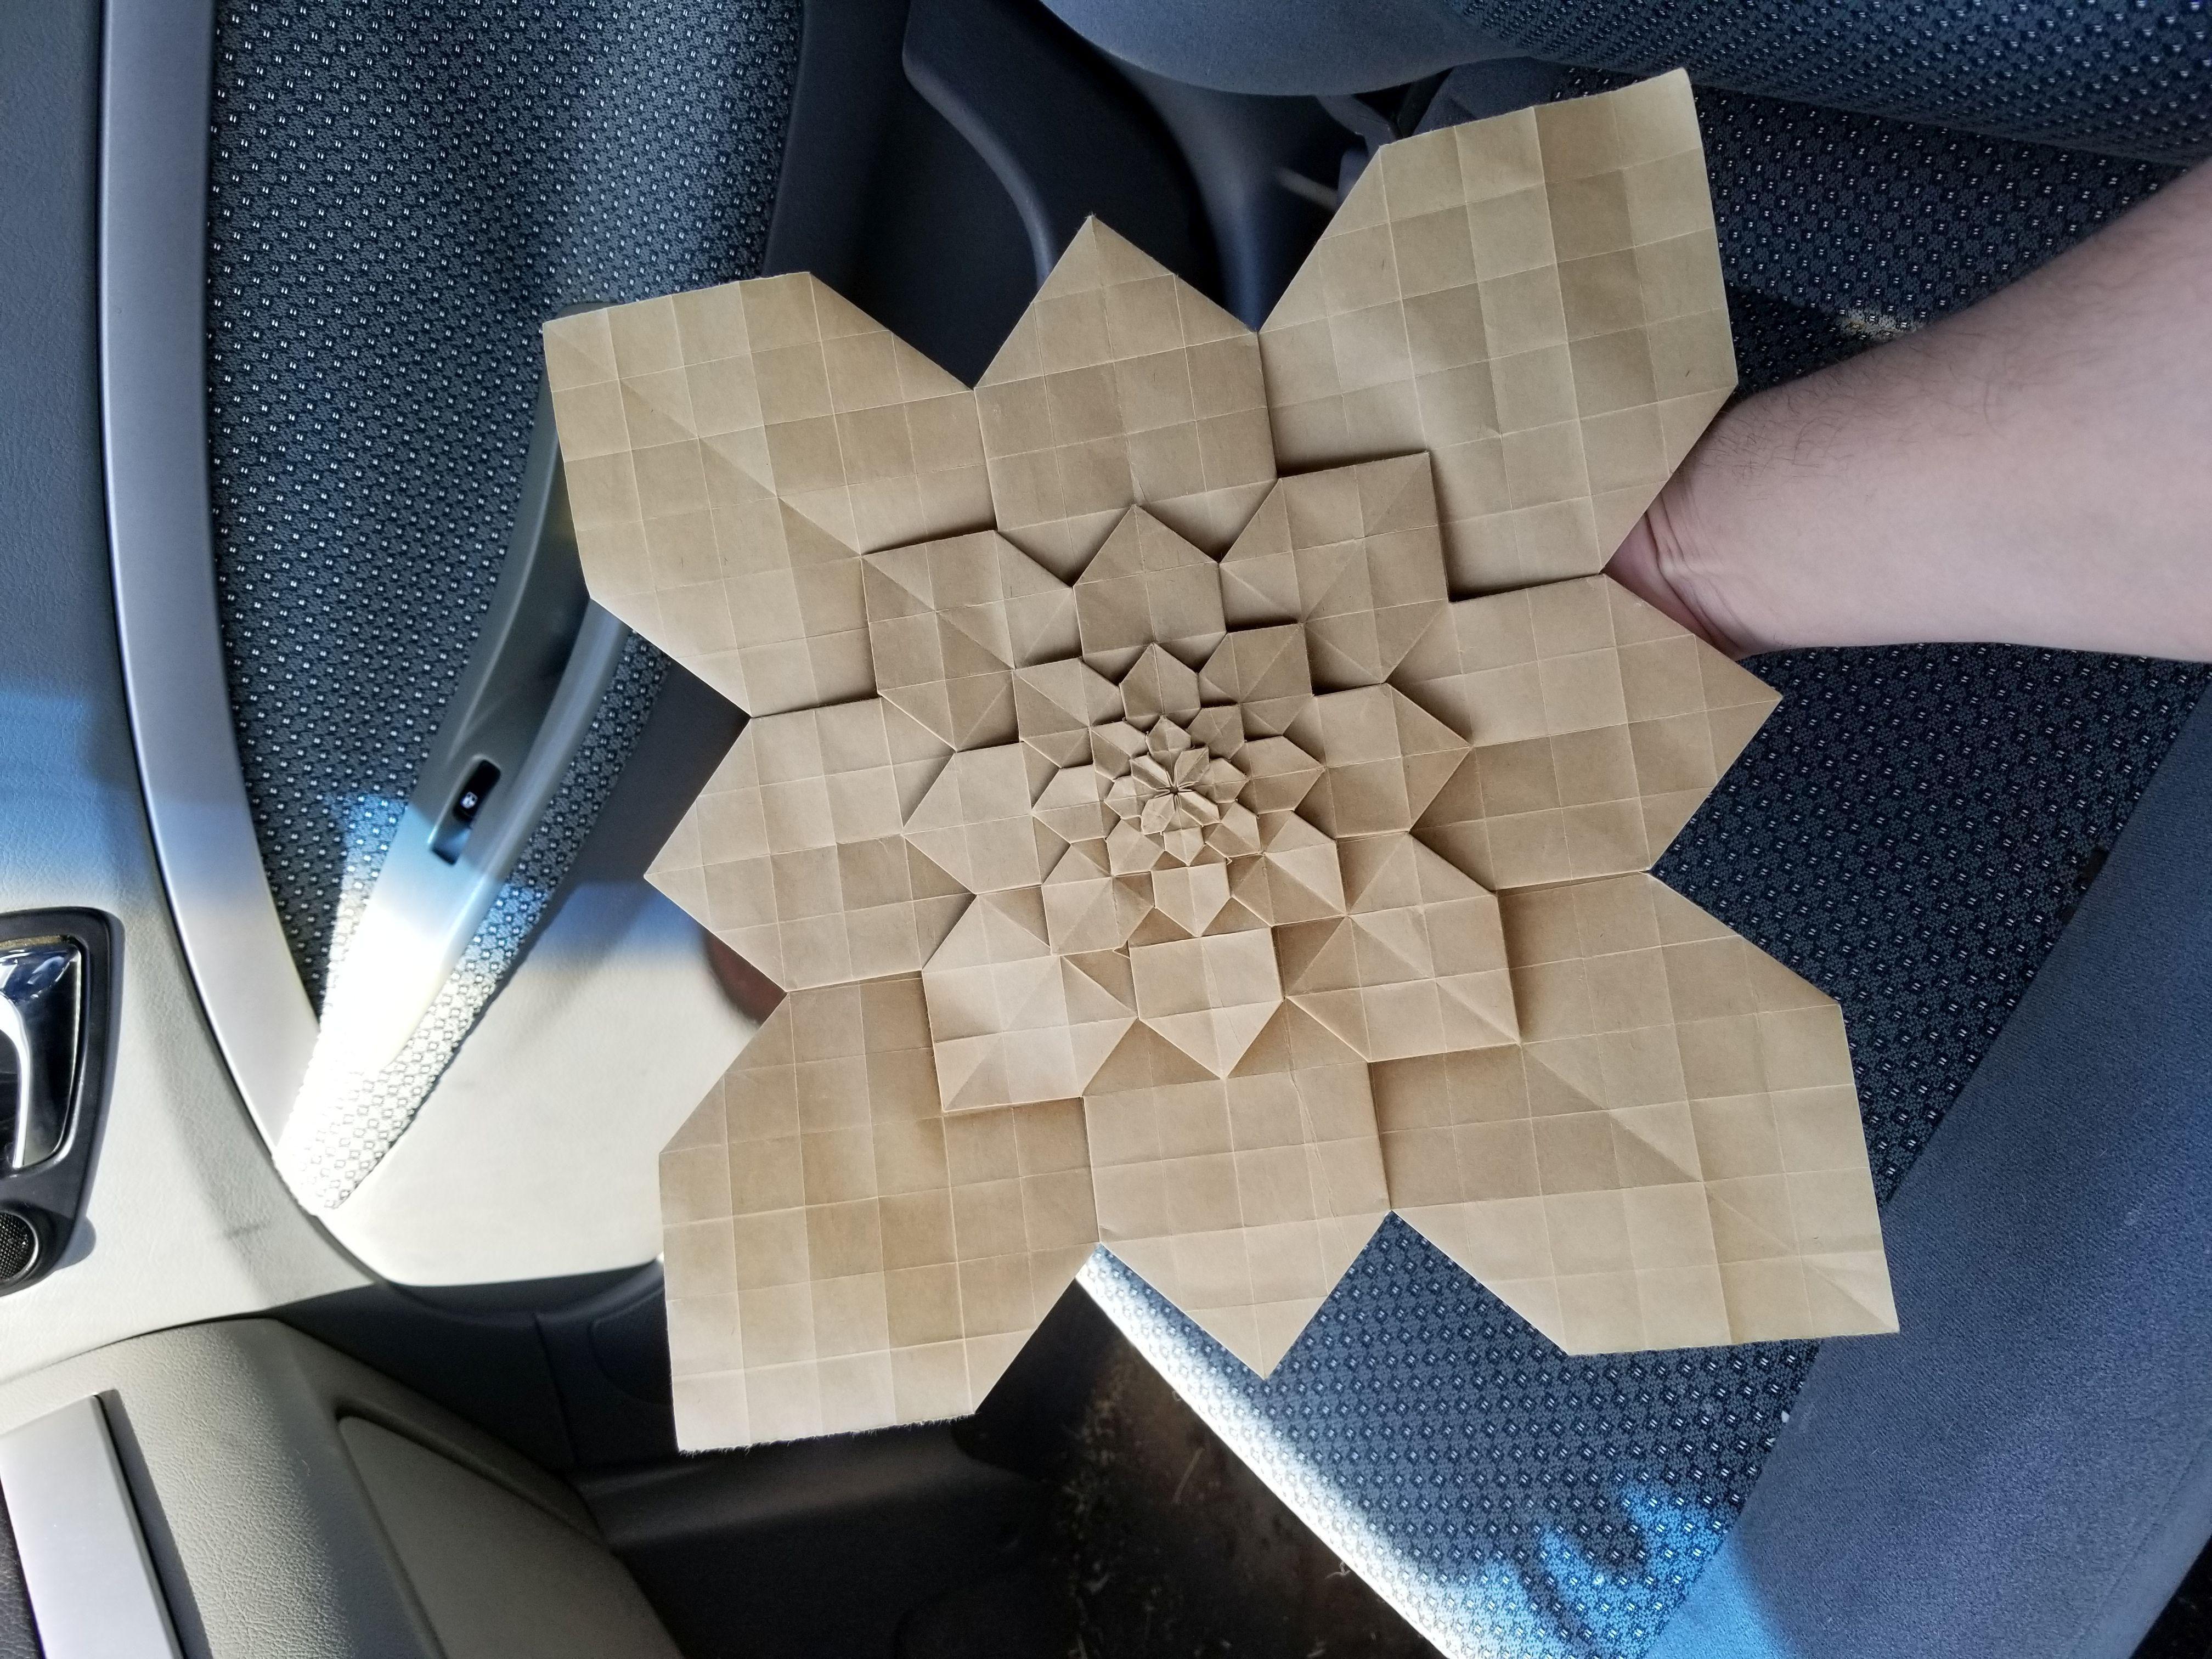 Origami Hydrangea Paper 1Ft X 1Ft ( 305Cm X 305Cm)